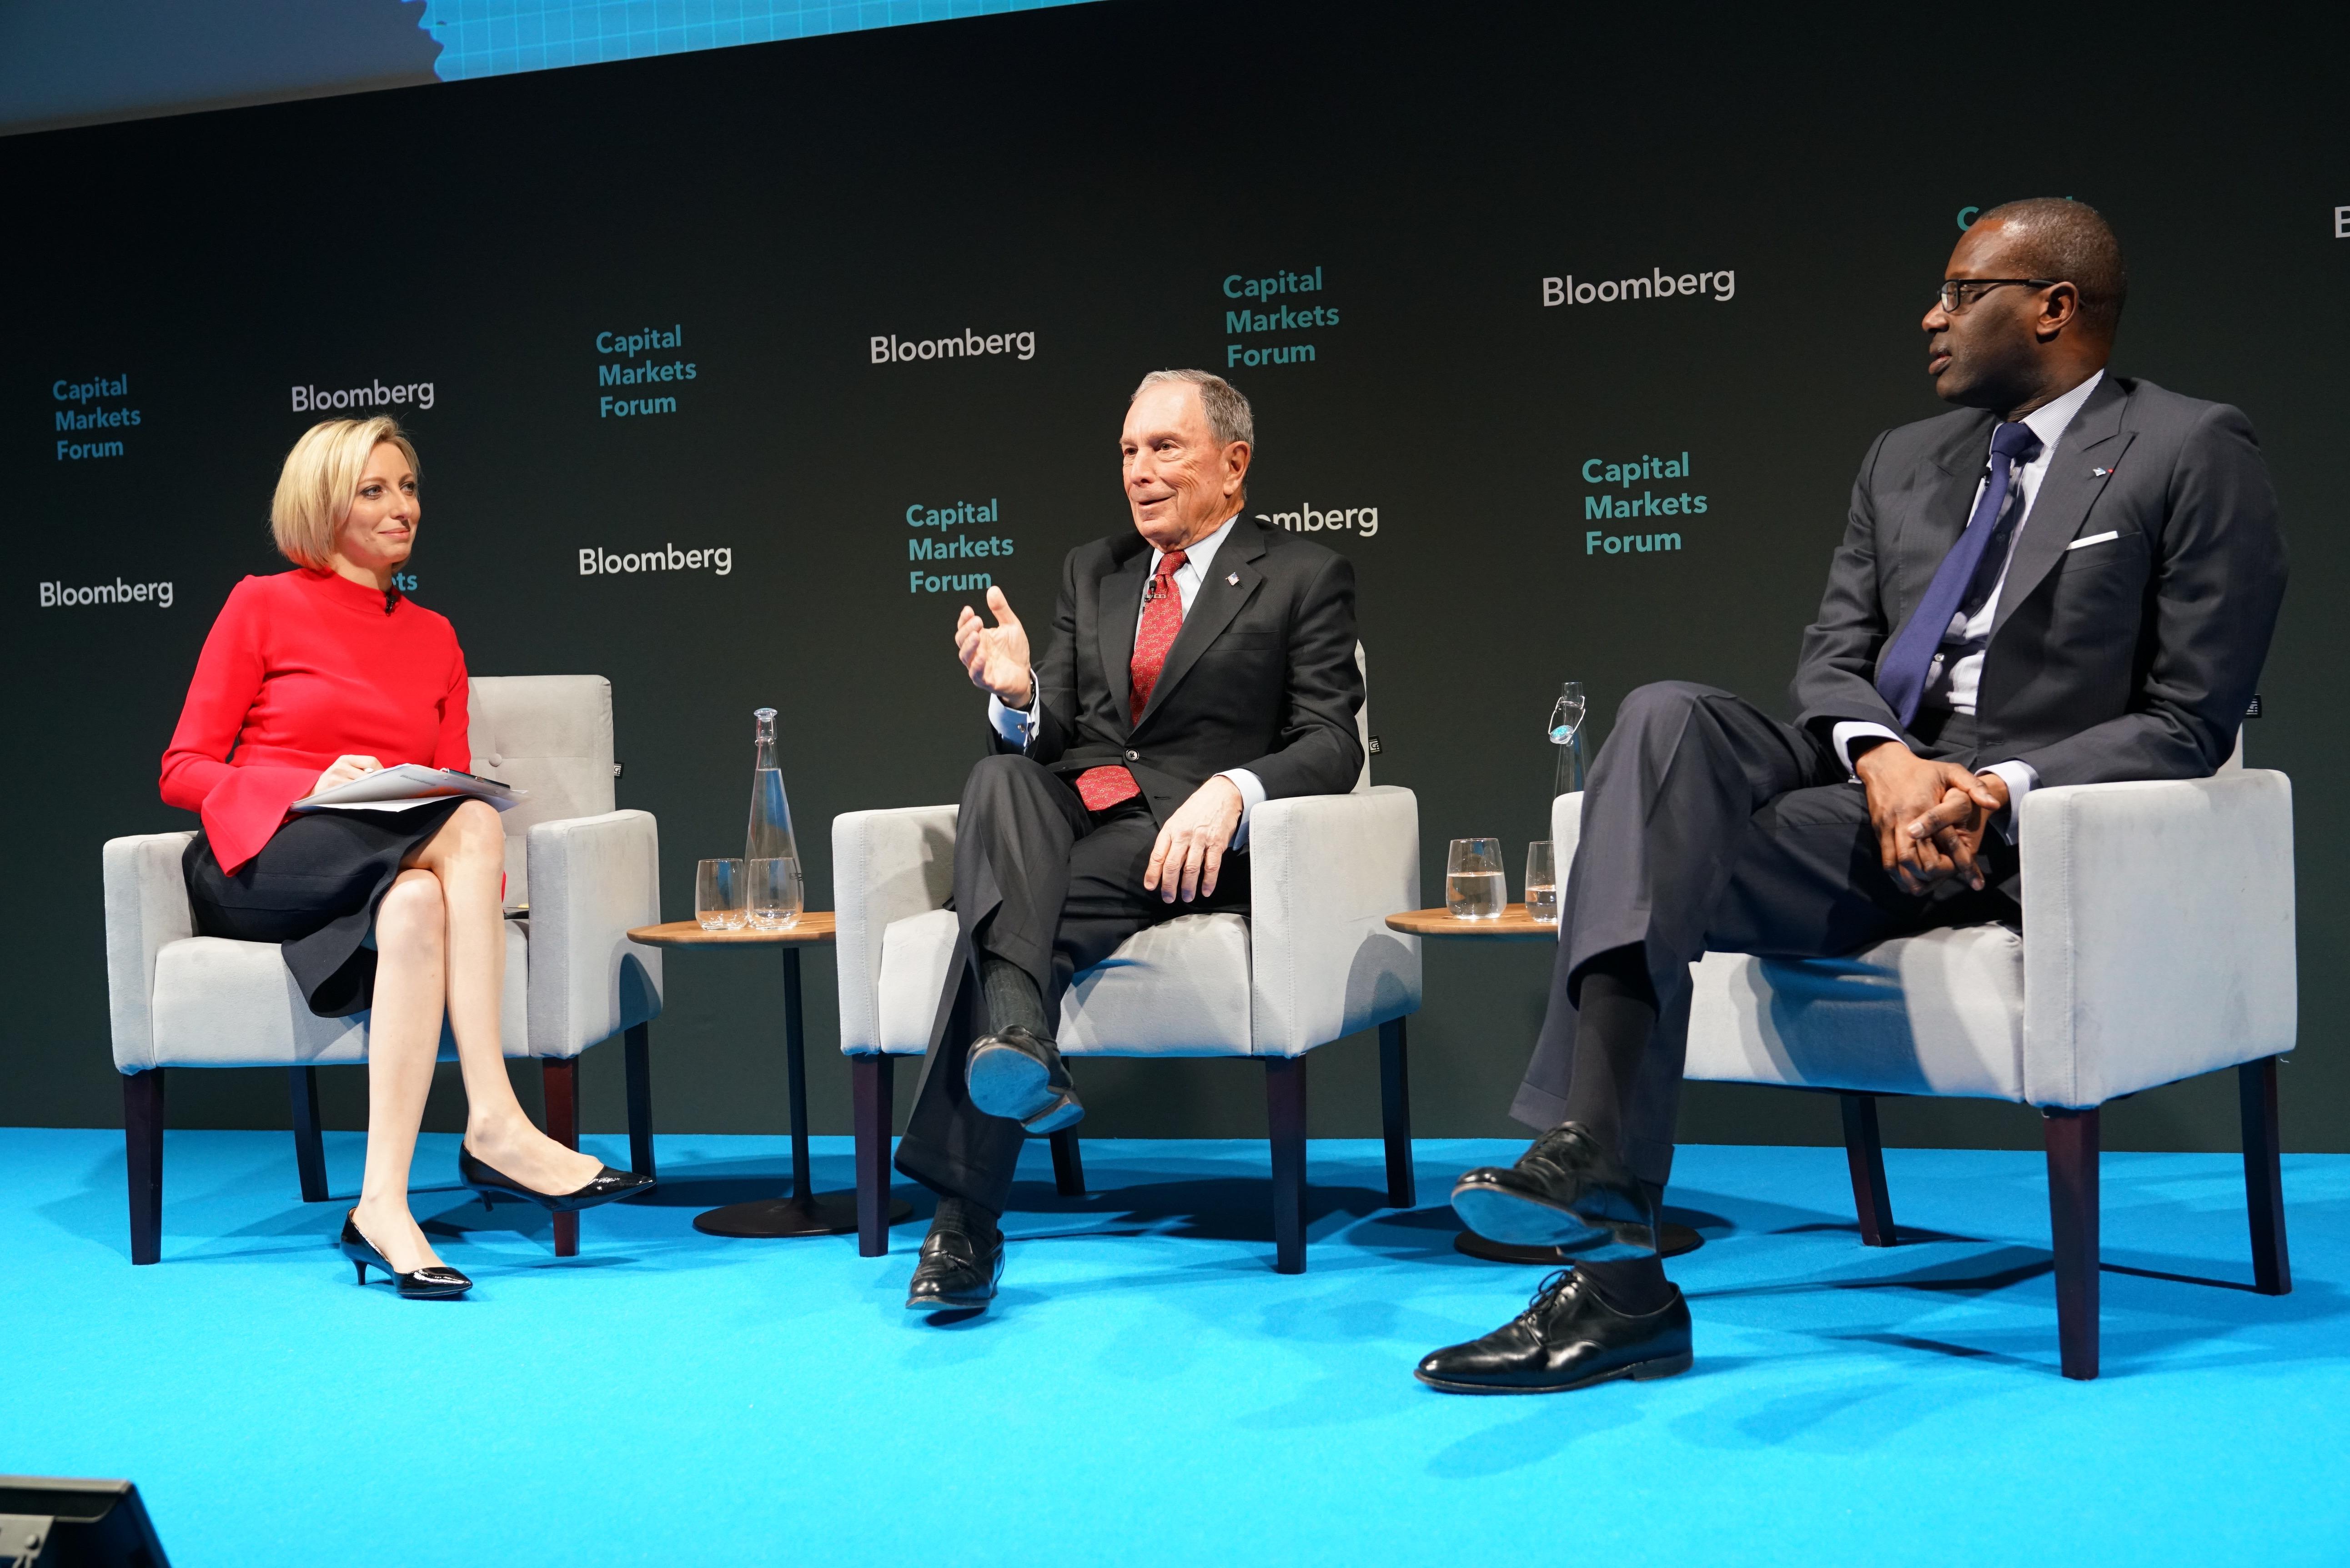 Francine Lacqua, Michael Bloomberg, Tidjiane Thiam